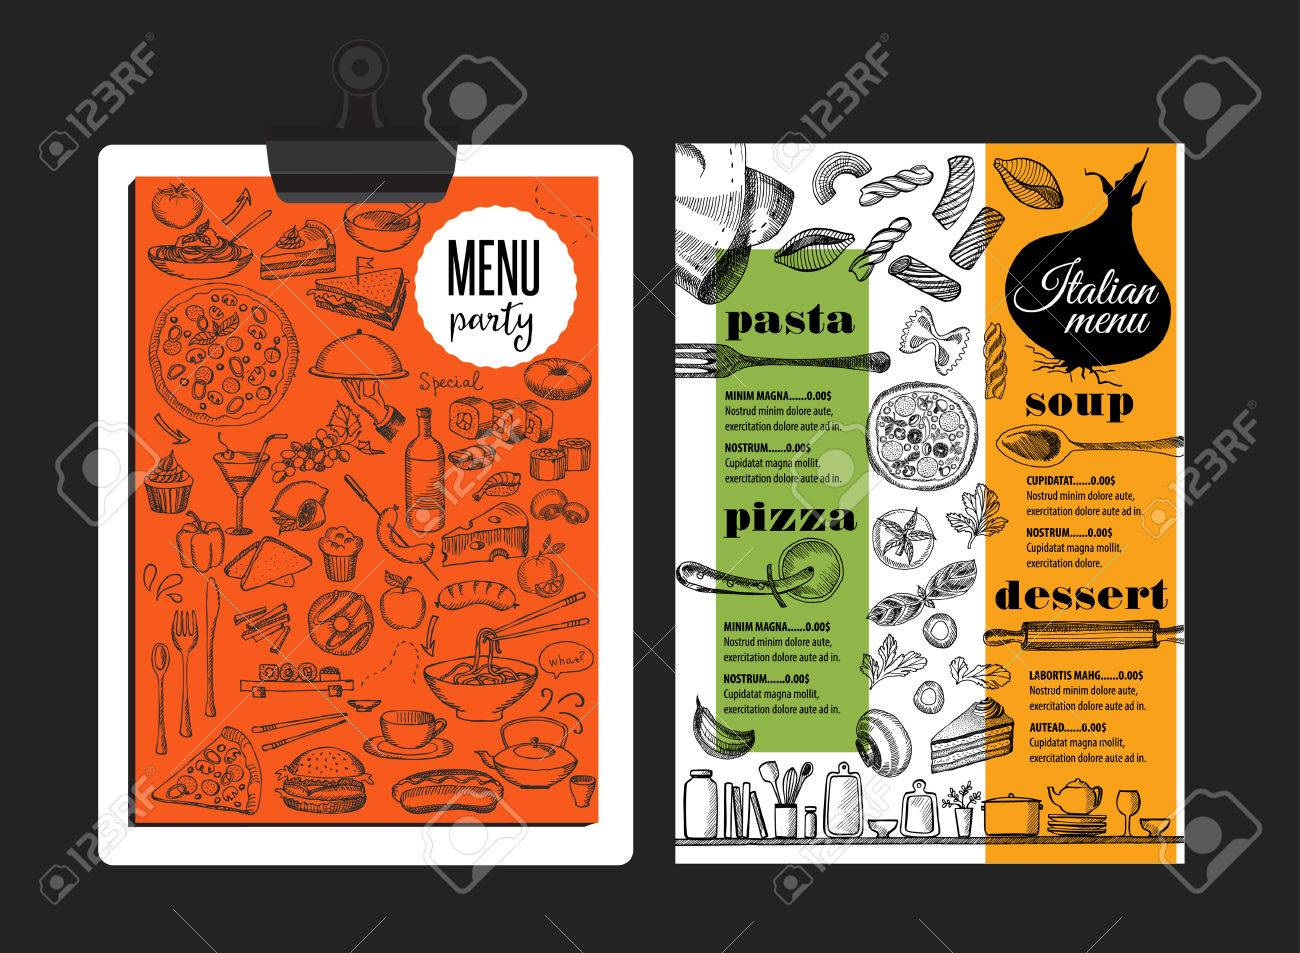 Italian Menu Placemat Food Restaurant Brochure Template Design